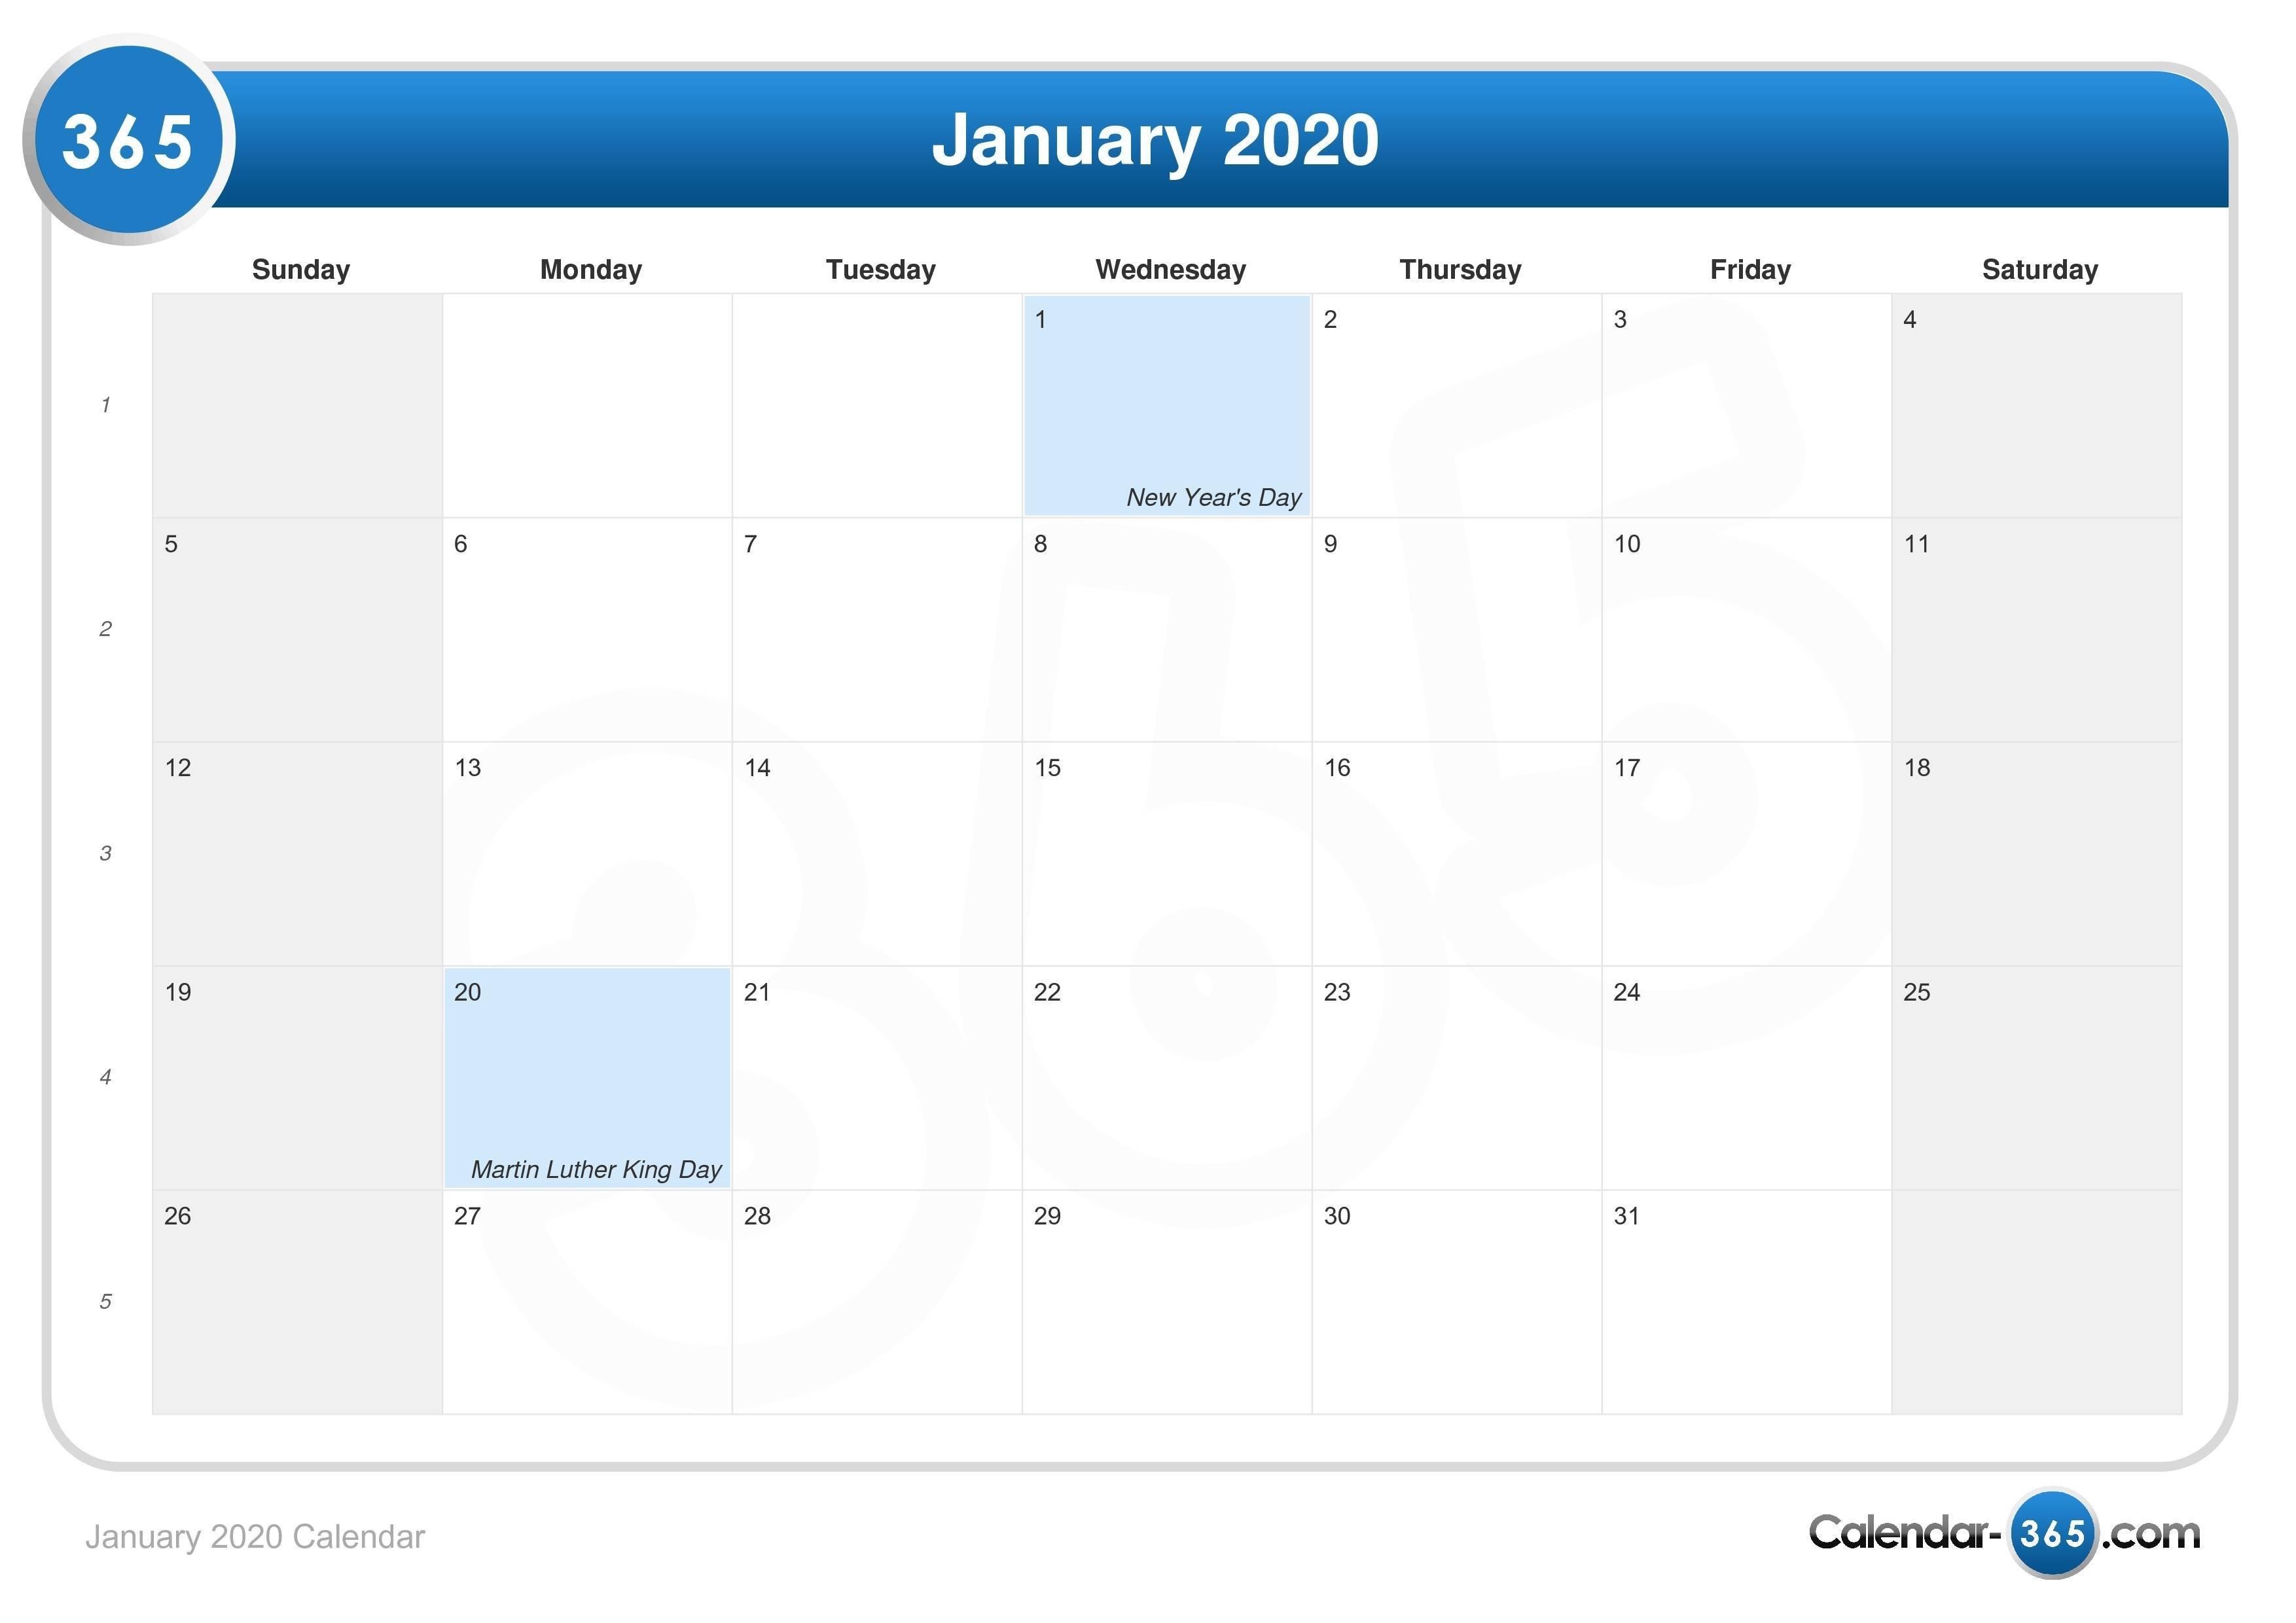 January 2020 Calendar-Moon Calendar January 2020